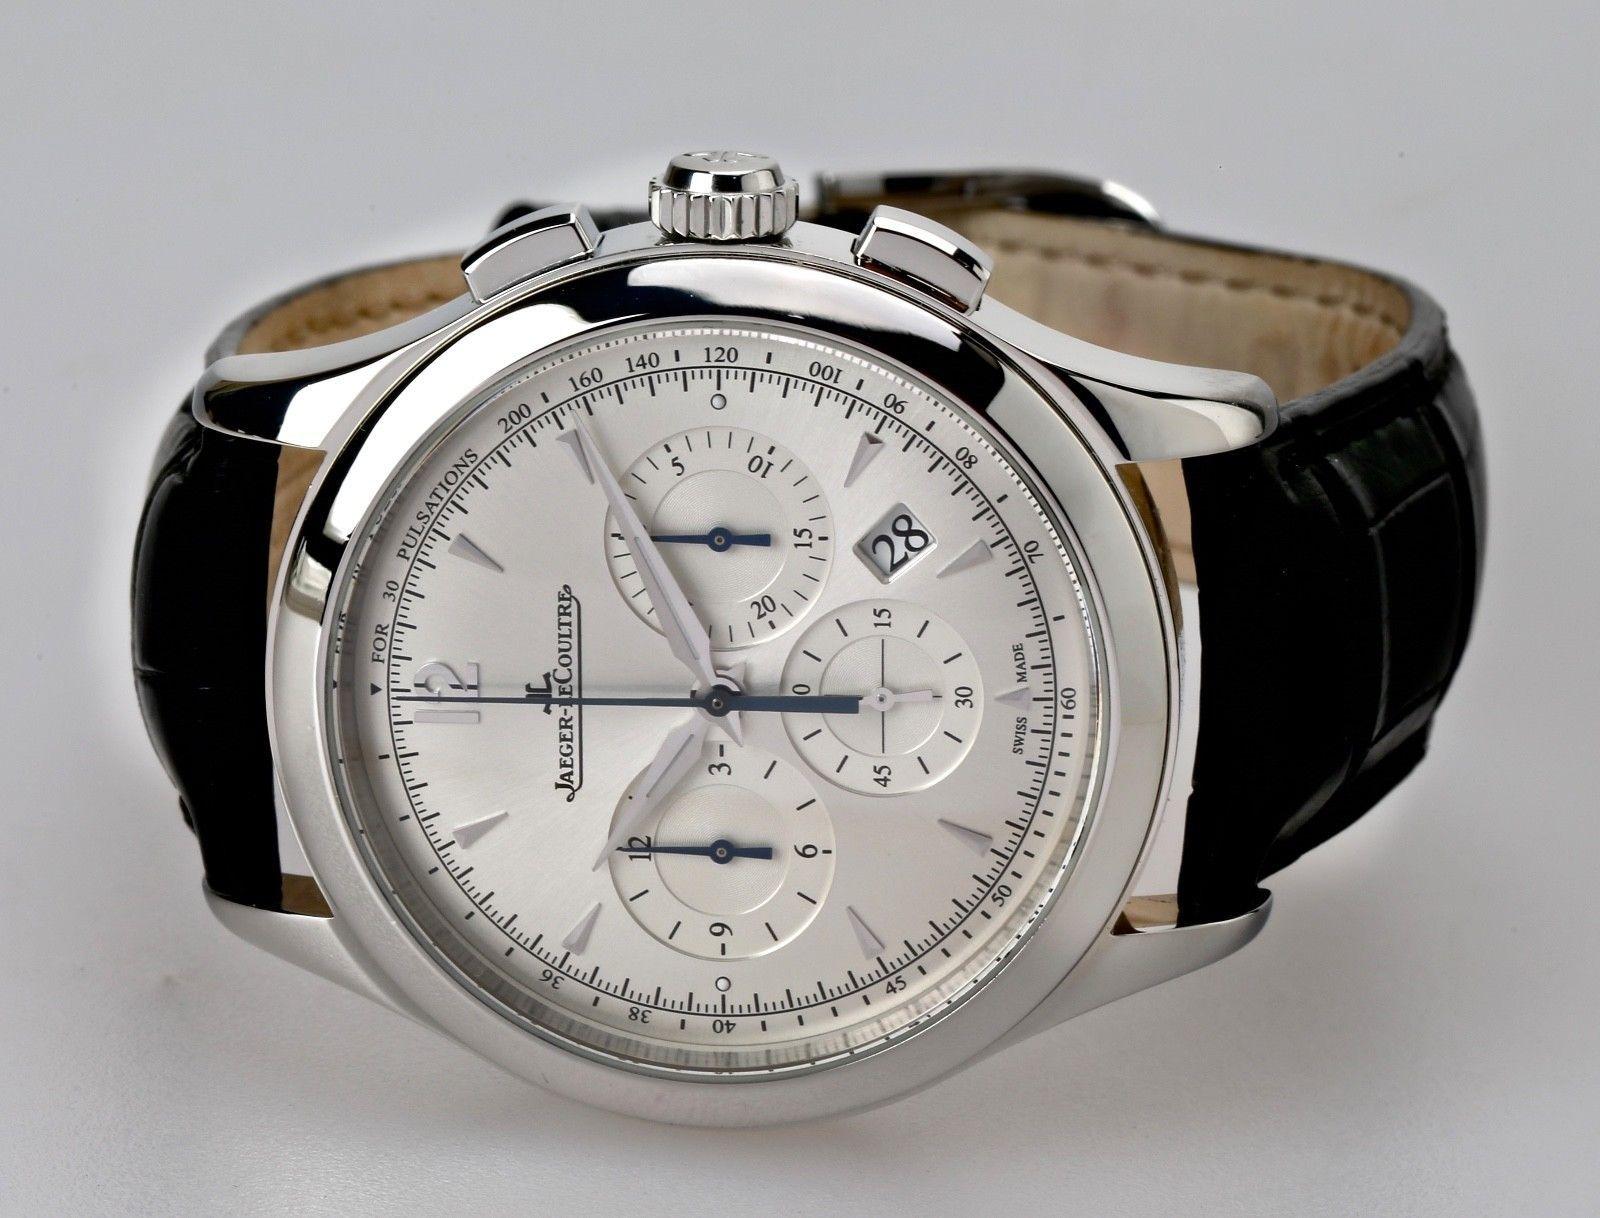 3d70cb84864 Jaeger LeCoultre Master Control Chronograph Automatic Ref  174.8.C1  Wristwatch